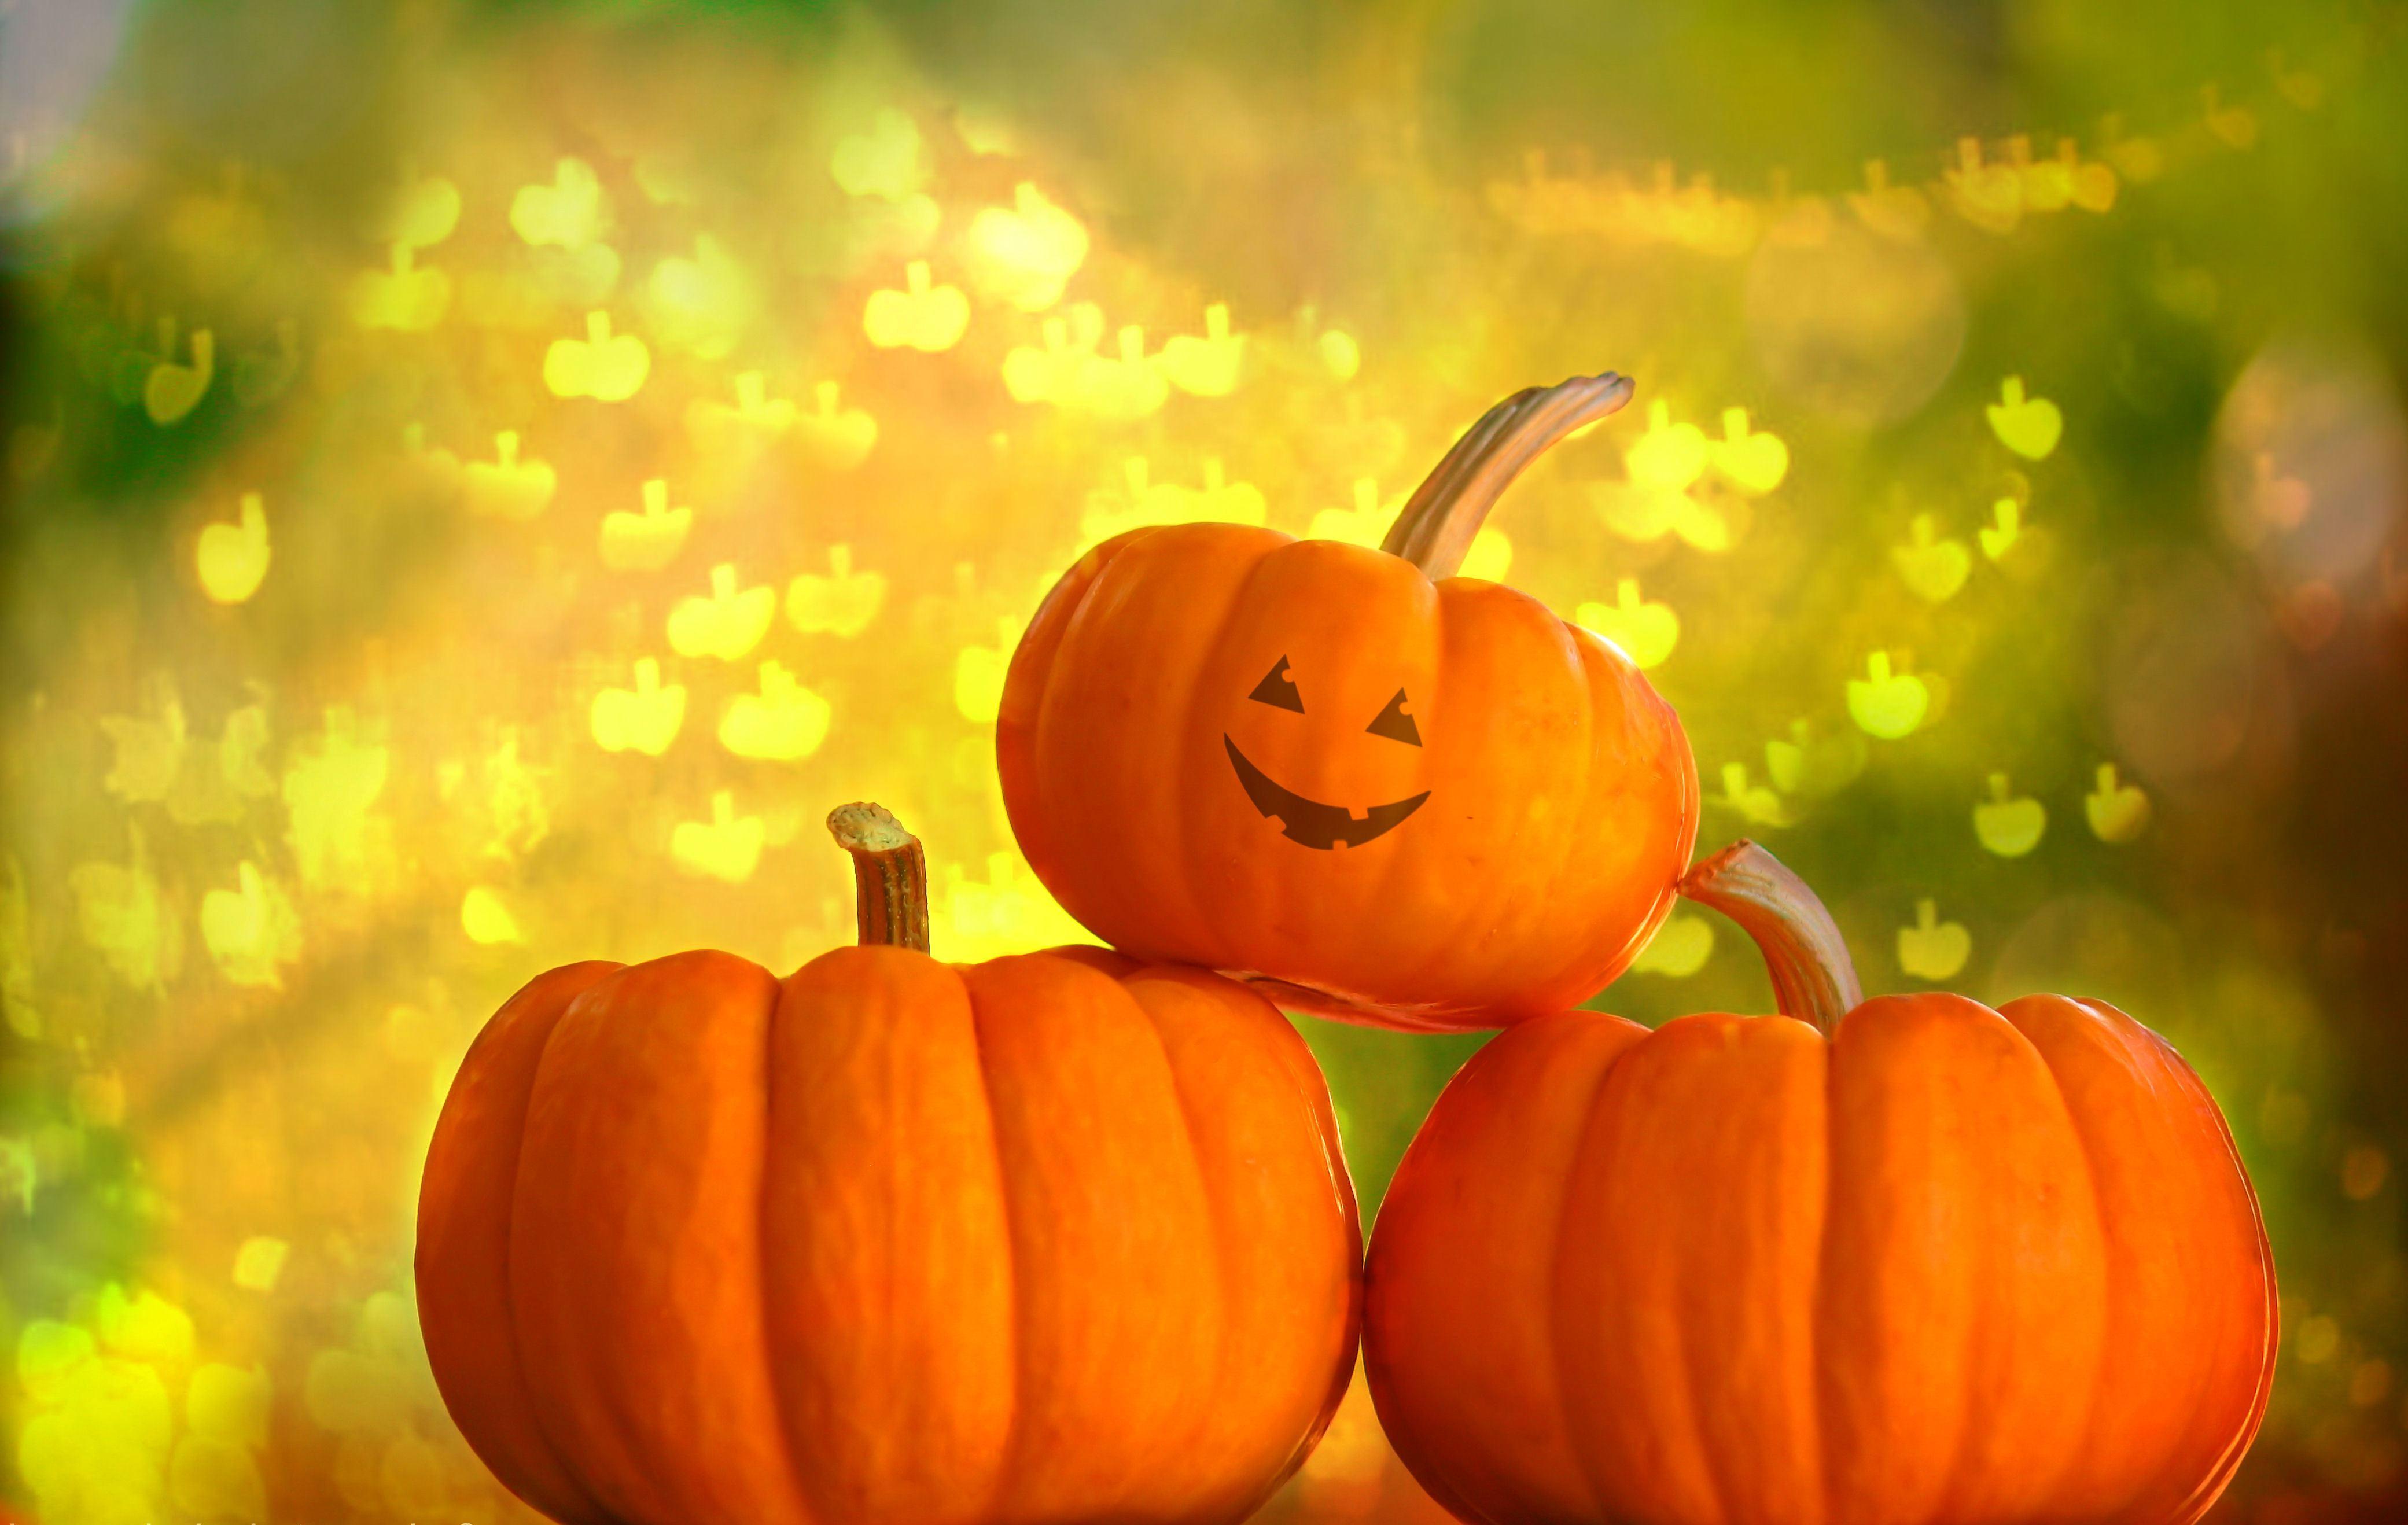 hellouin-helloween-tykvy-fon.jpg